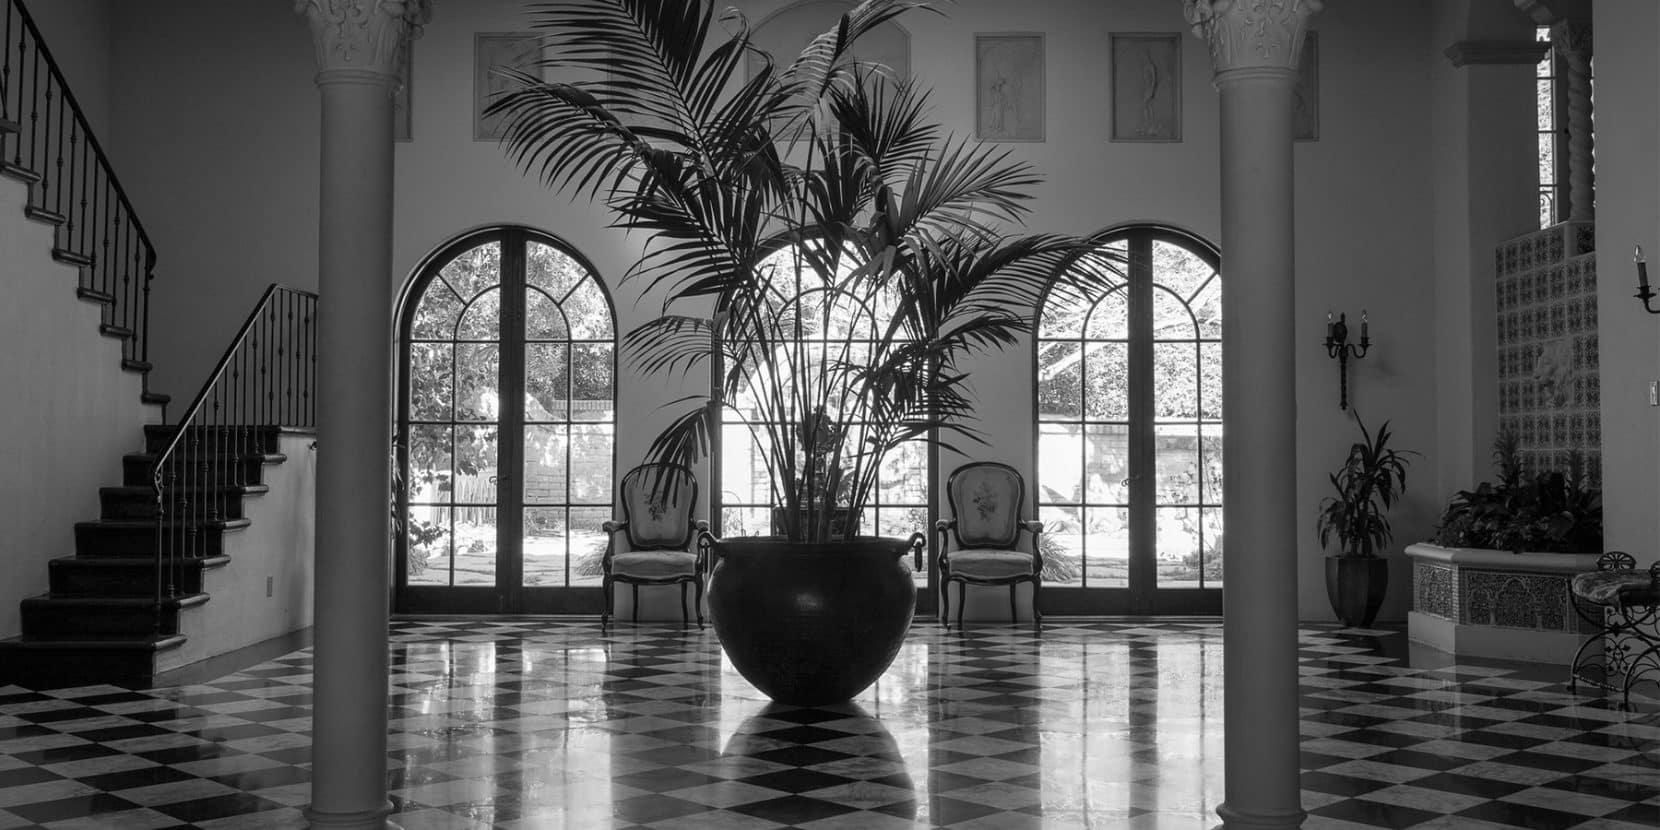 20th century Los Angeles African-American Architect Paul R. Williams Janna Ireland book Regarding Paul R. Williams: A Photographer's View L.A. La Cañada Flintridge Janna Ireland